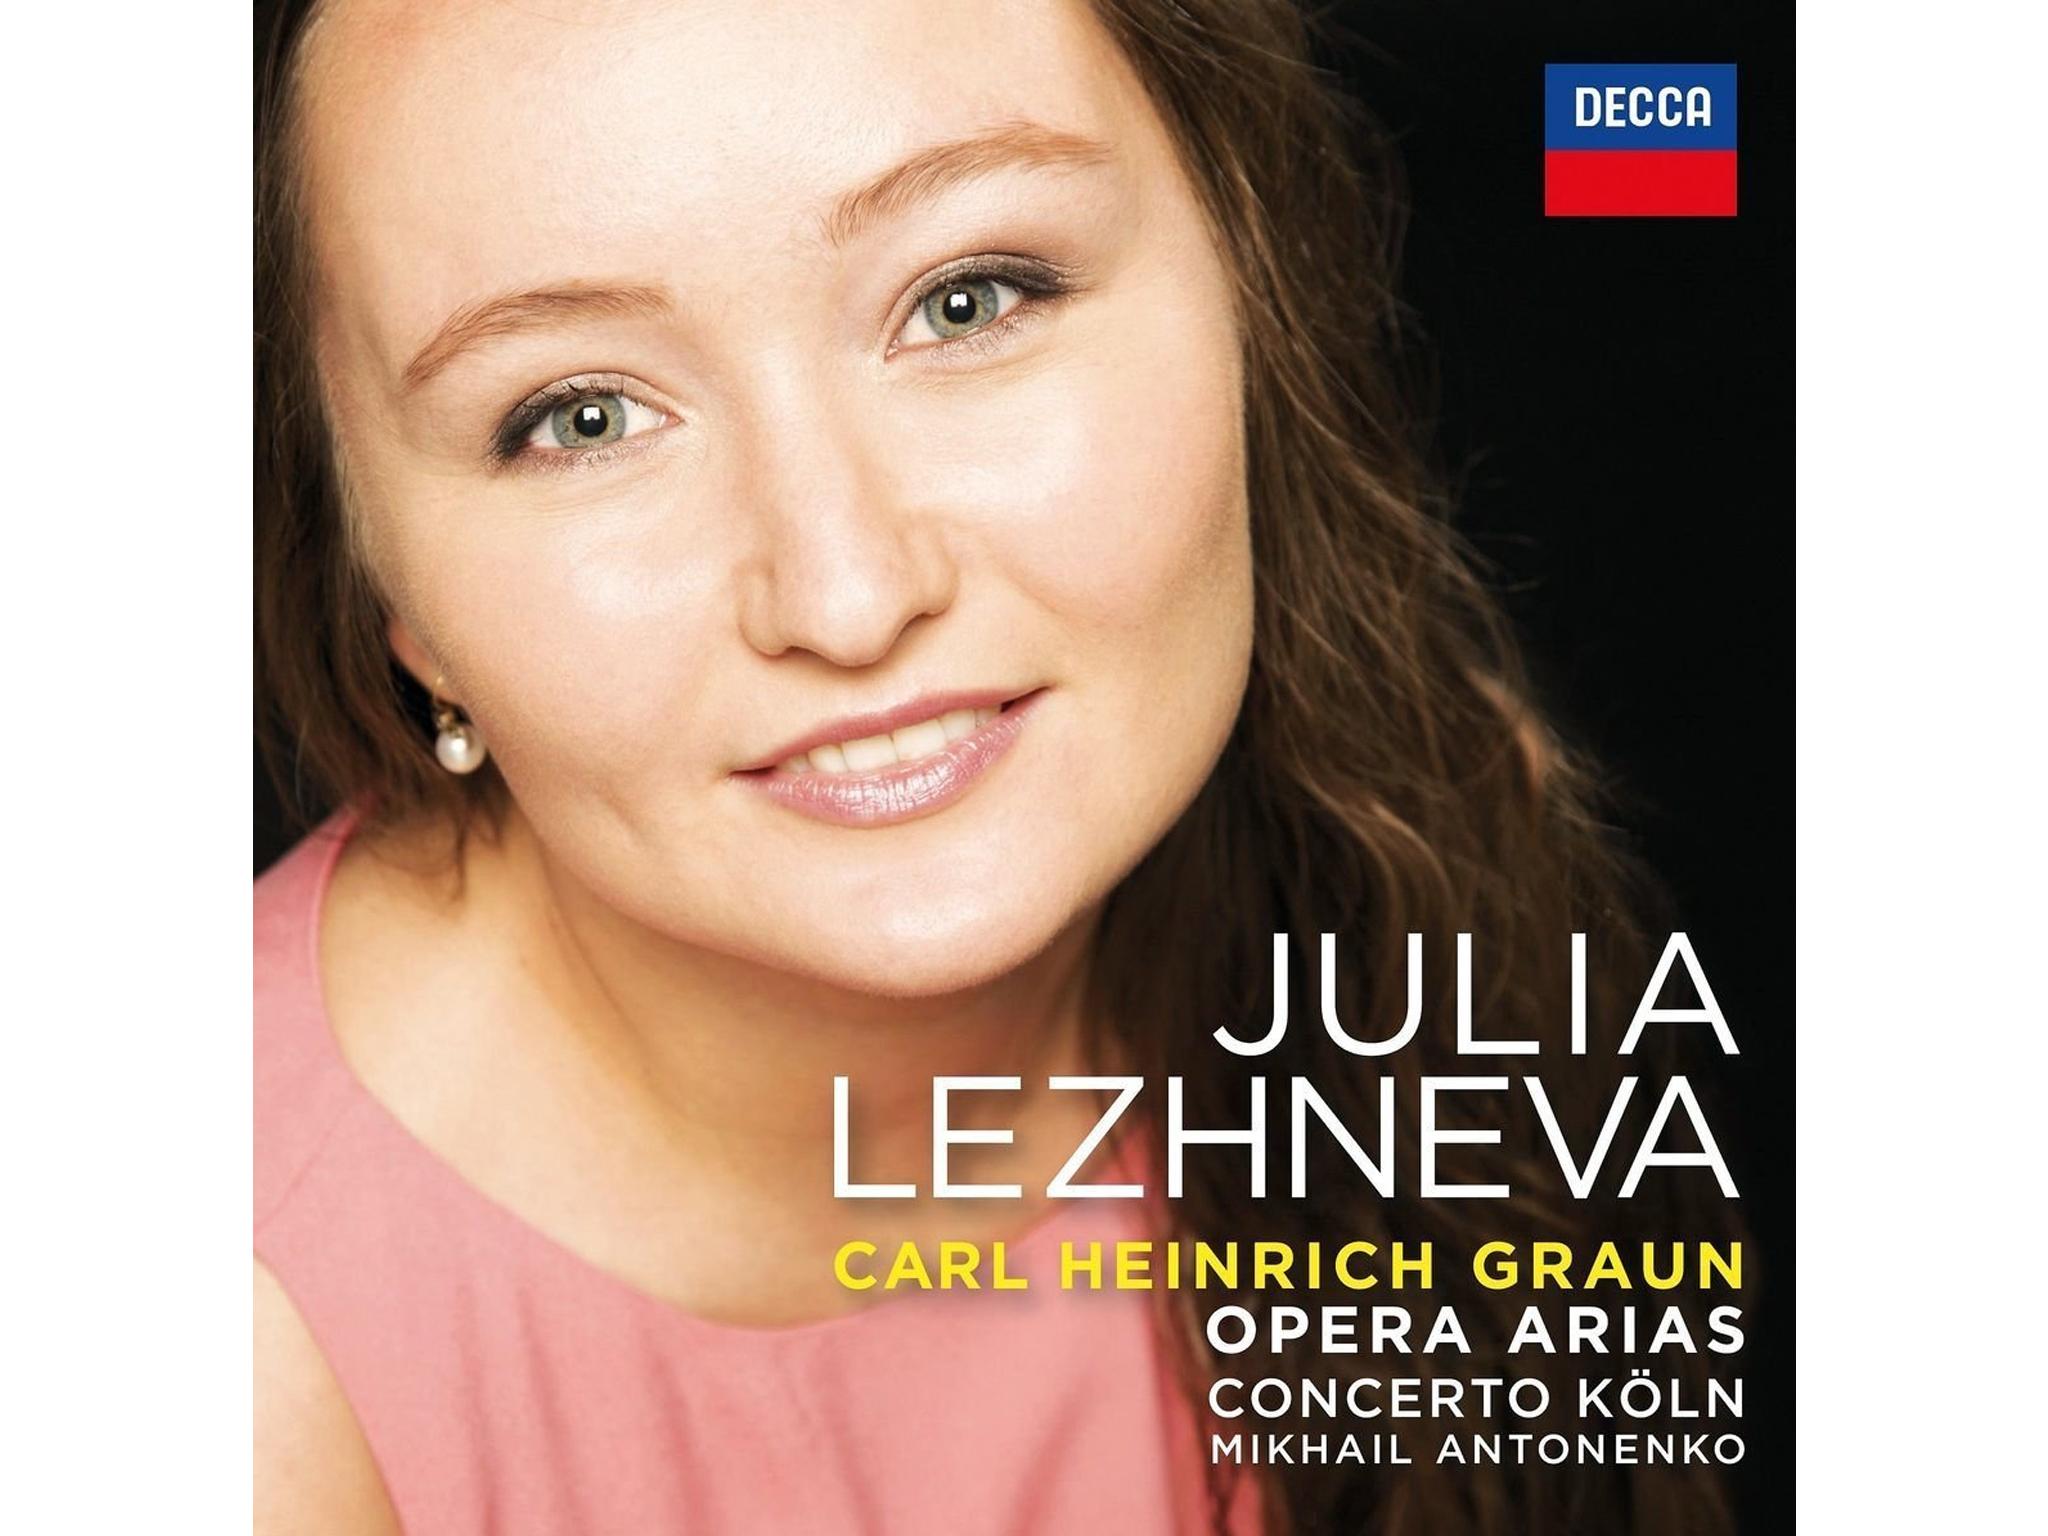 Julia Lezhneva - Carl Heinrich Graun